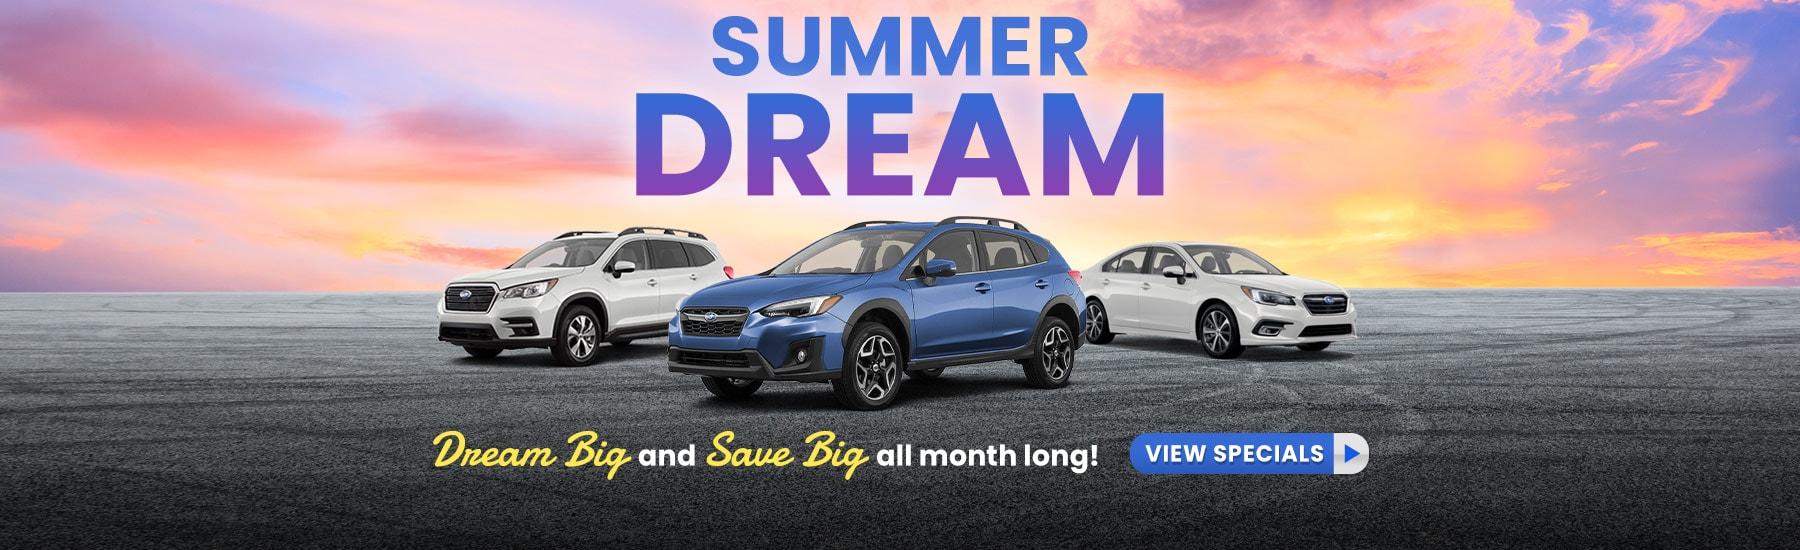 Subaru Dealers Nj >> Subaru Dealers Nj Upcoming New Car Release 2020